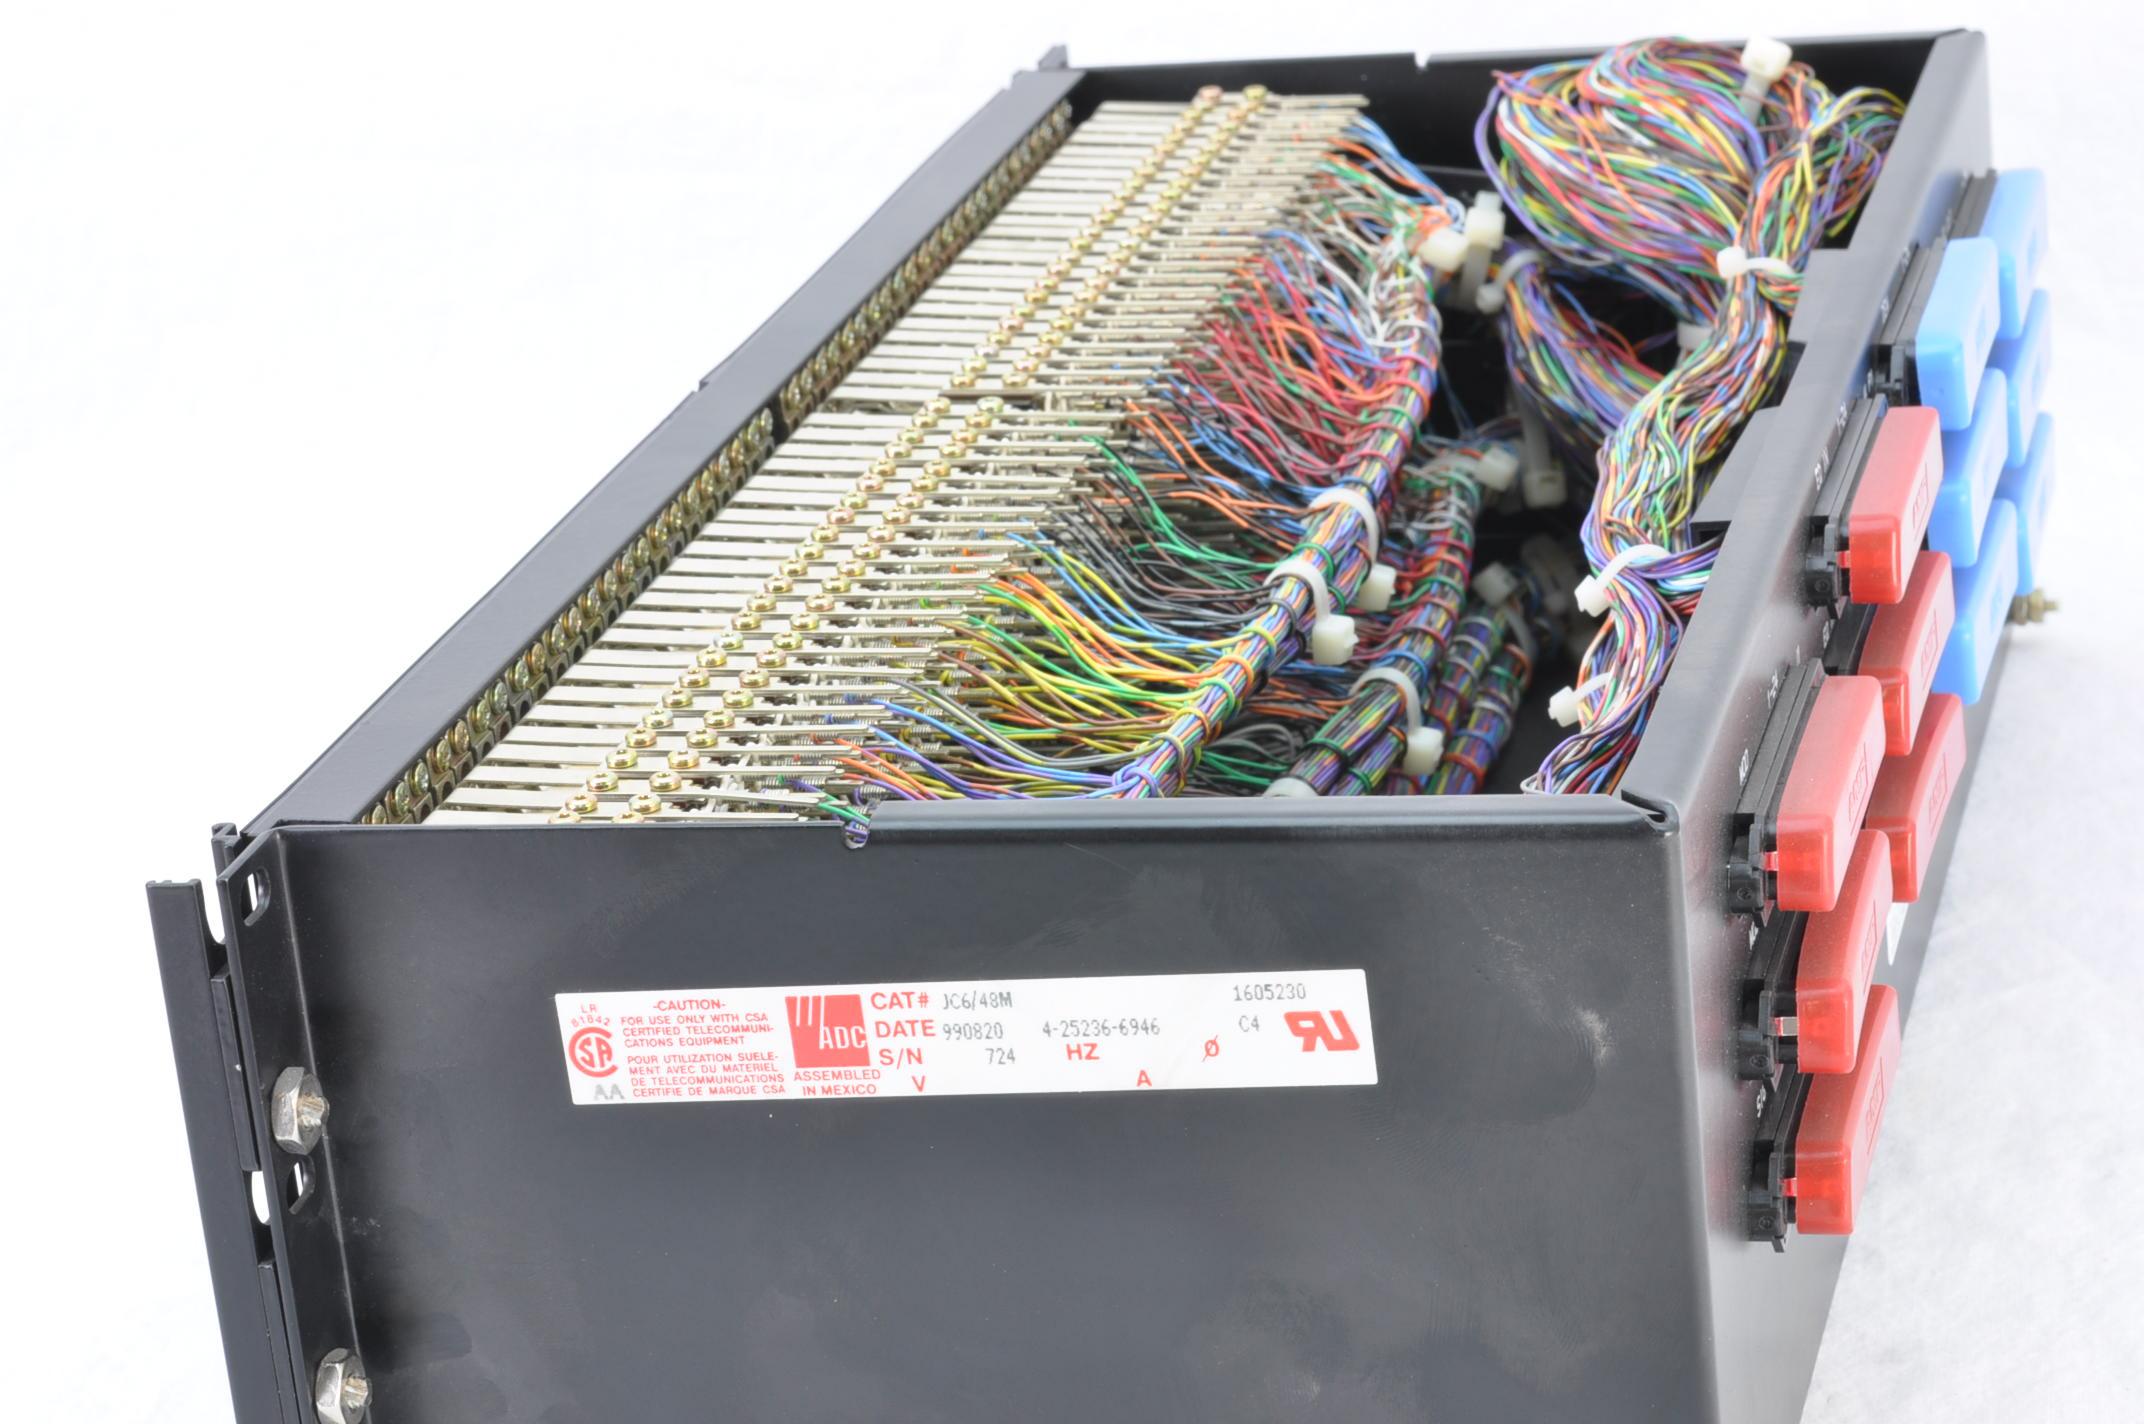 adc jc6/48m 6-wire 48-circuit bantam connectorized ... output jack wiring bantam jack wiring #10